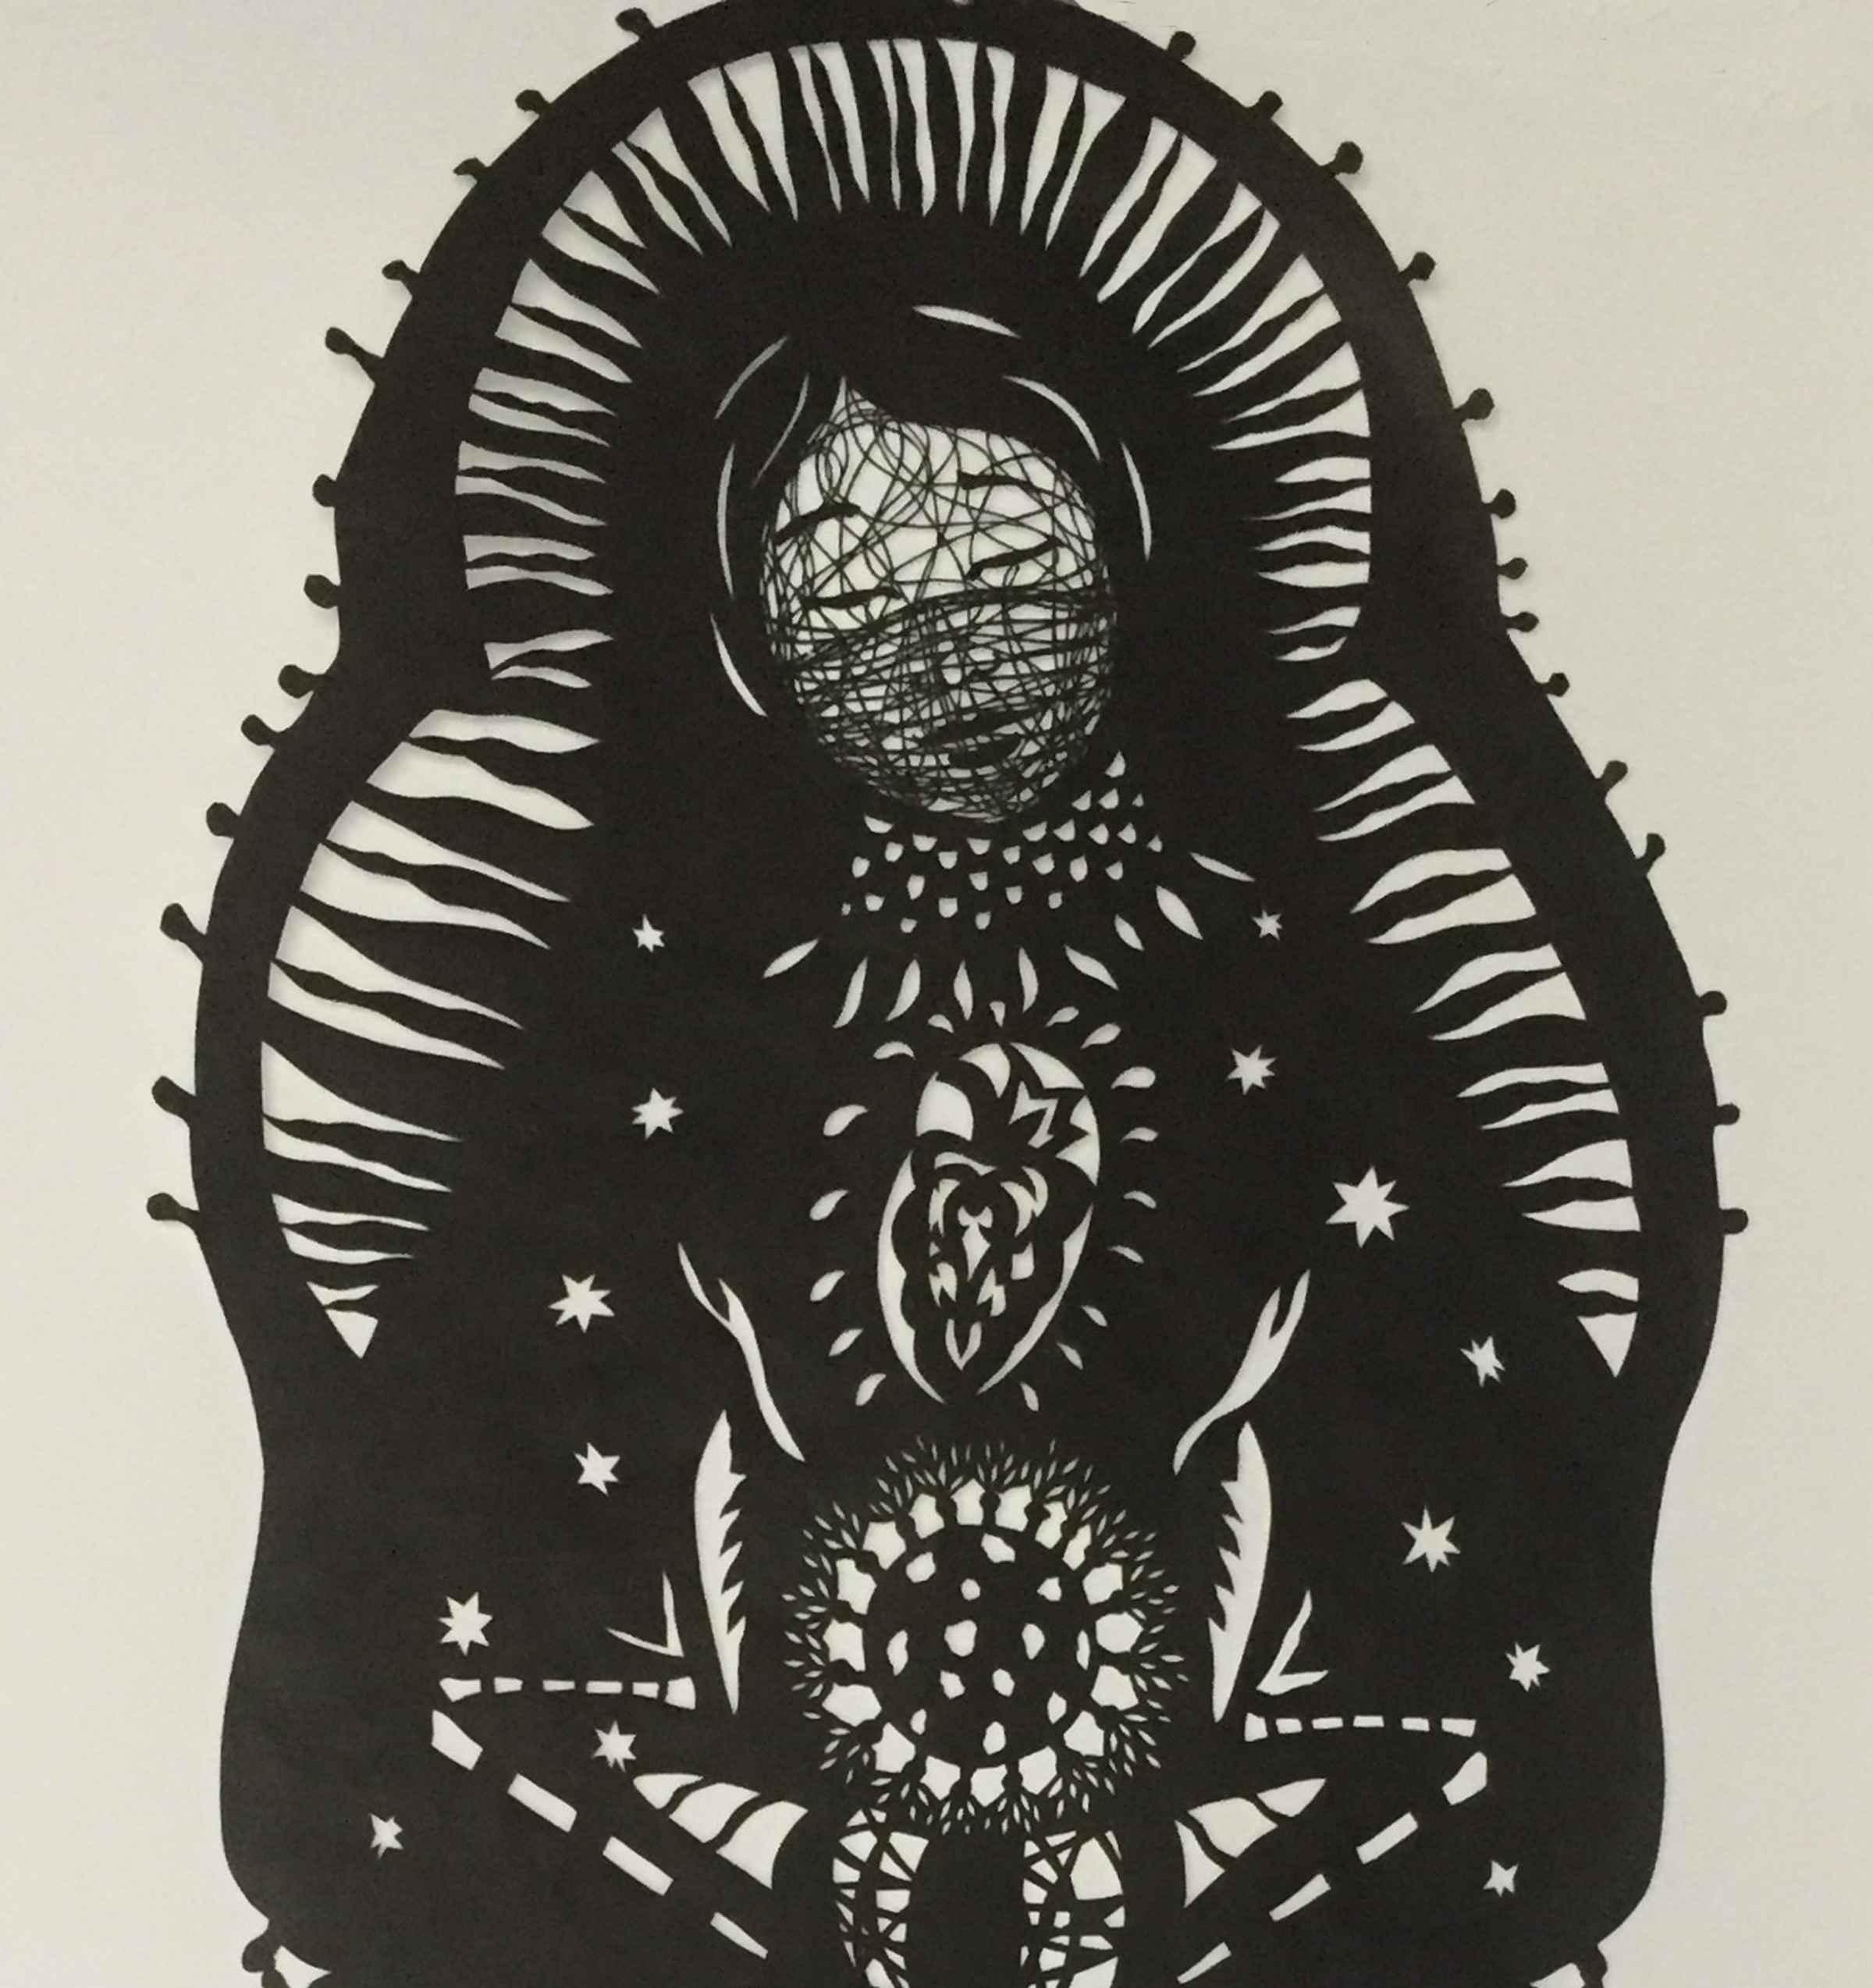 A papercut design by Beatrice Coron.